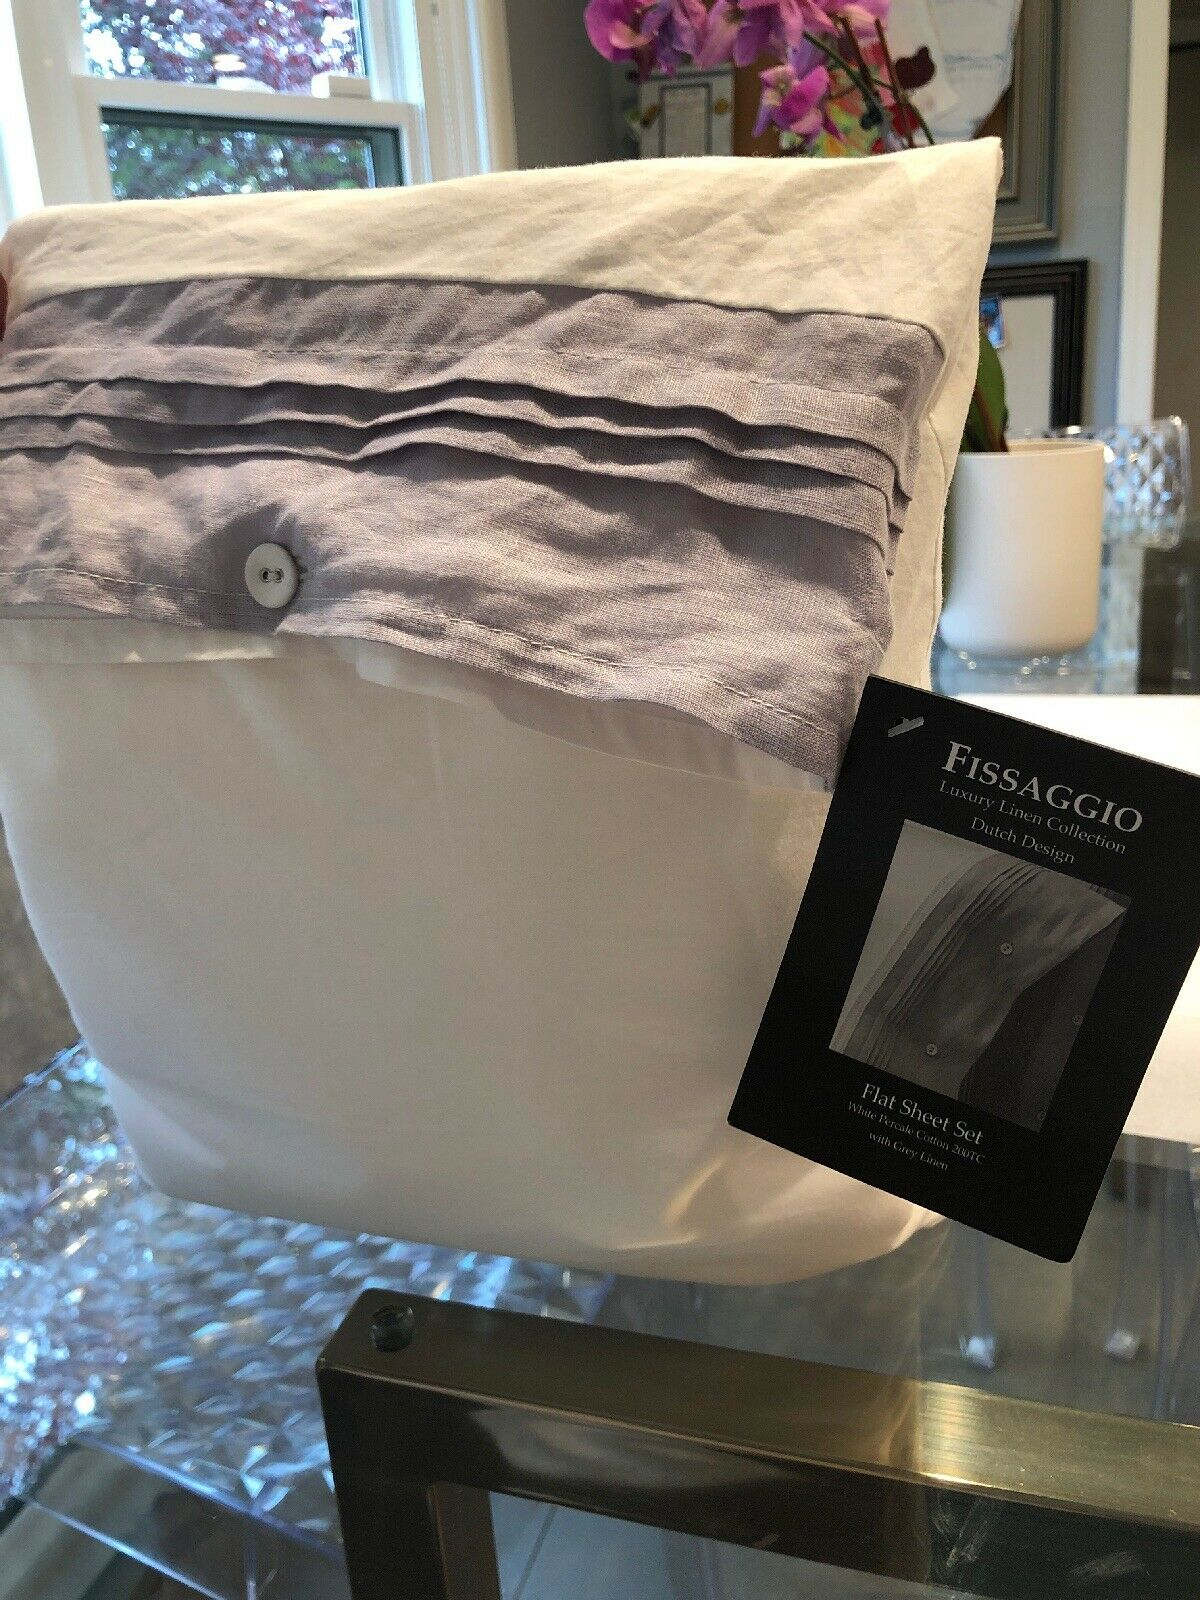 Fissaggio King Sheet Set Weiß Cotton grau Linen Border Brand New Free Shipping